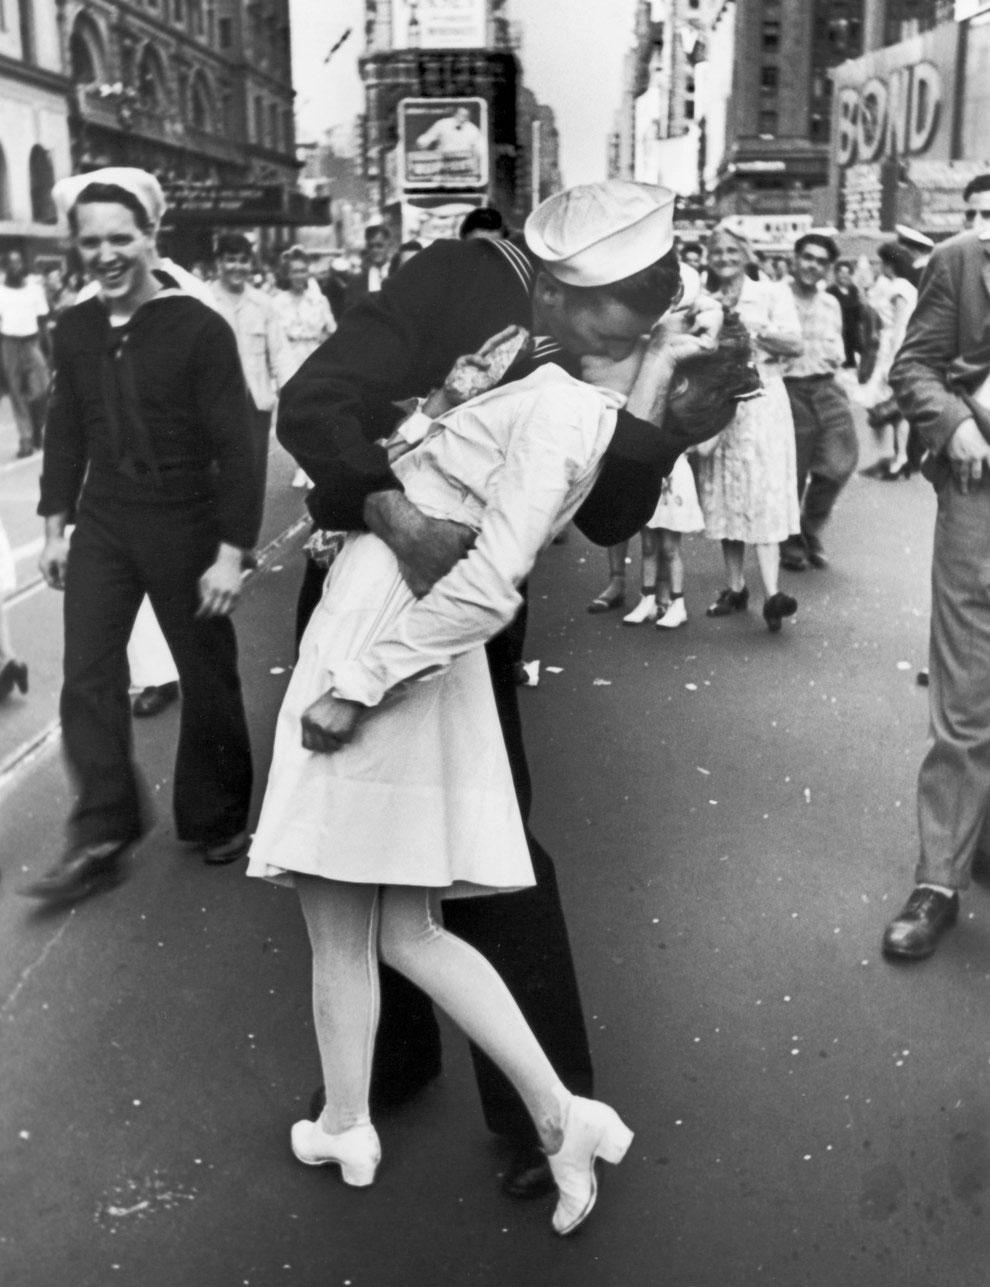 sarbatorirea-zilei-victoriei-asupra-Japoniei-in-Times-Square